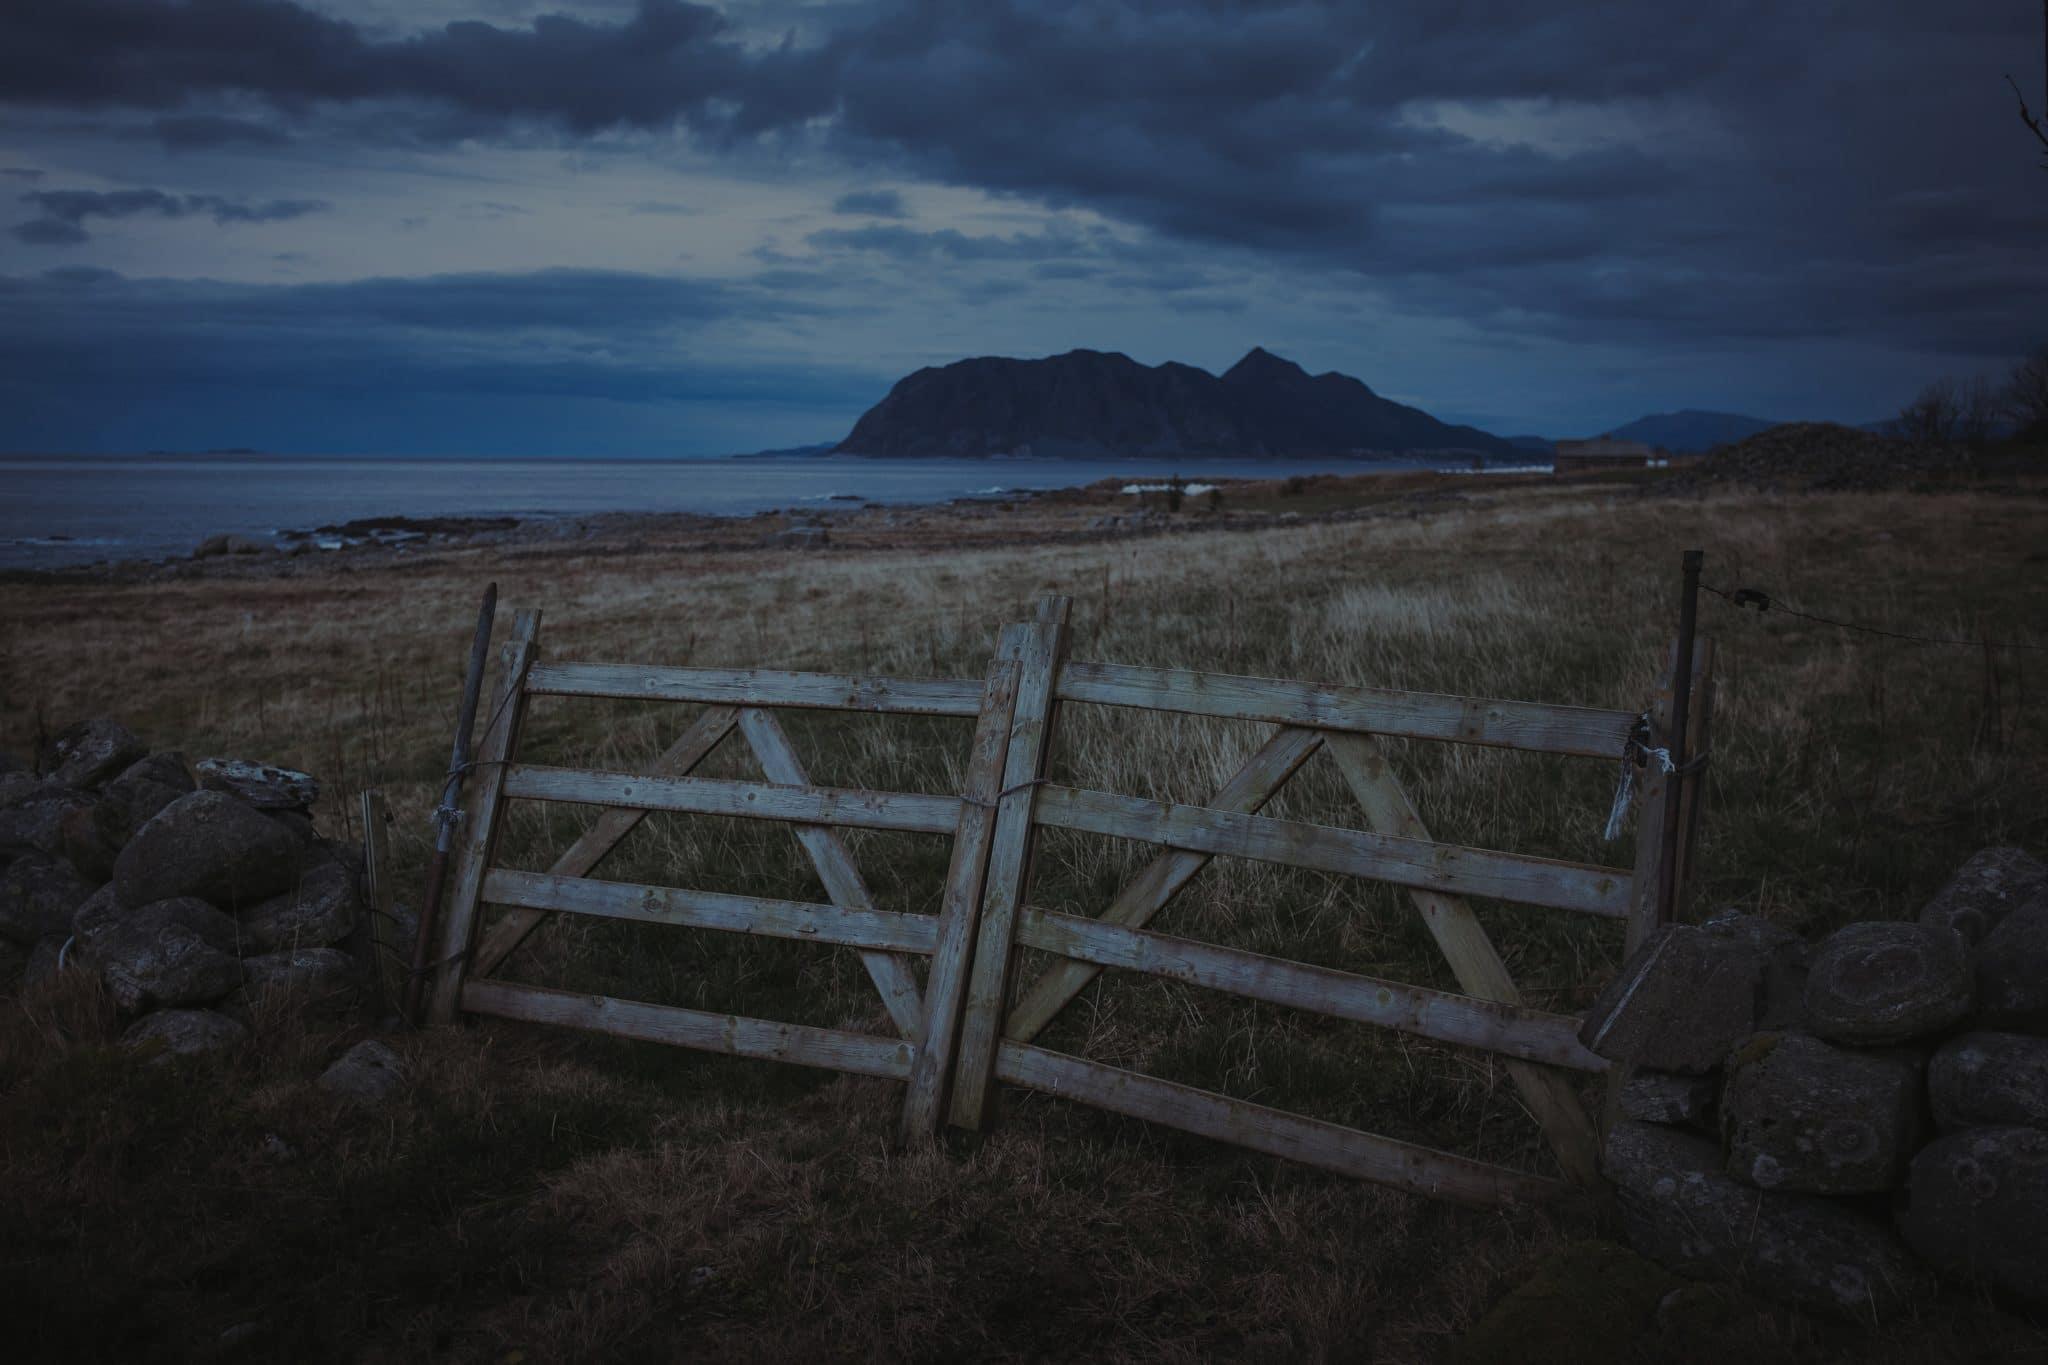 A broken fence serving as a barrier to a field